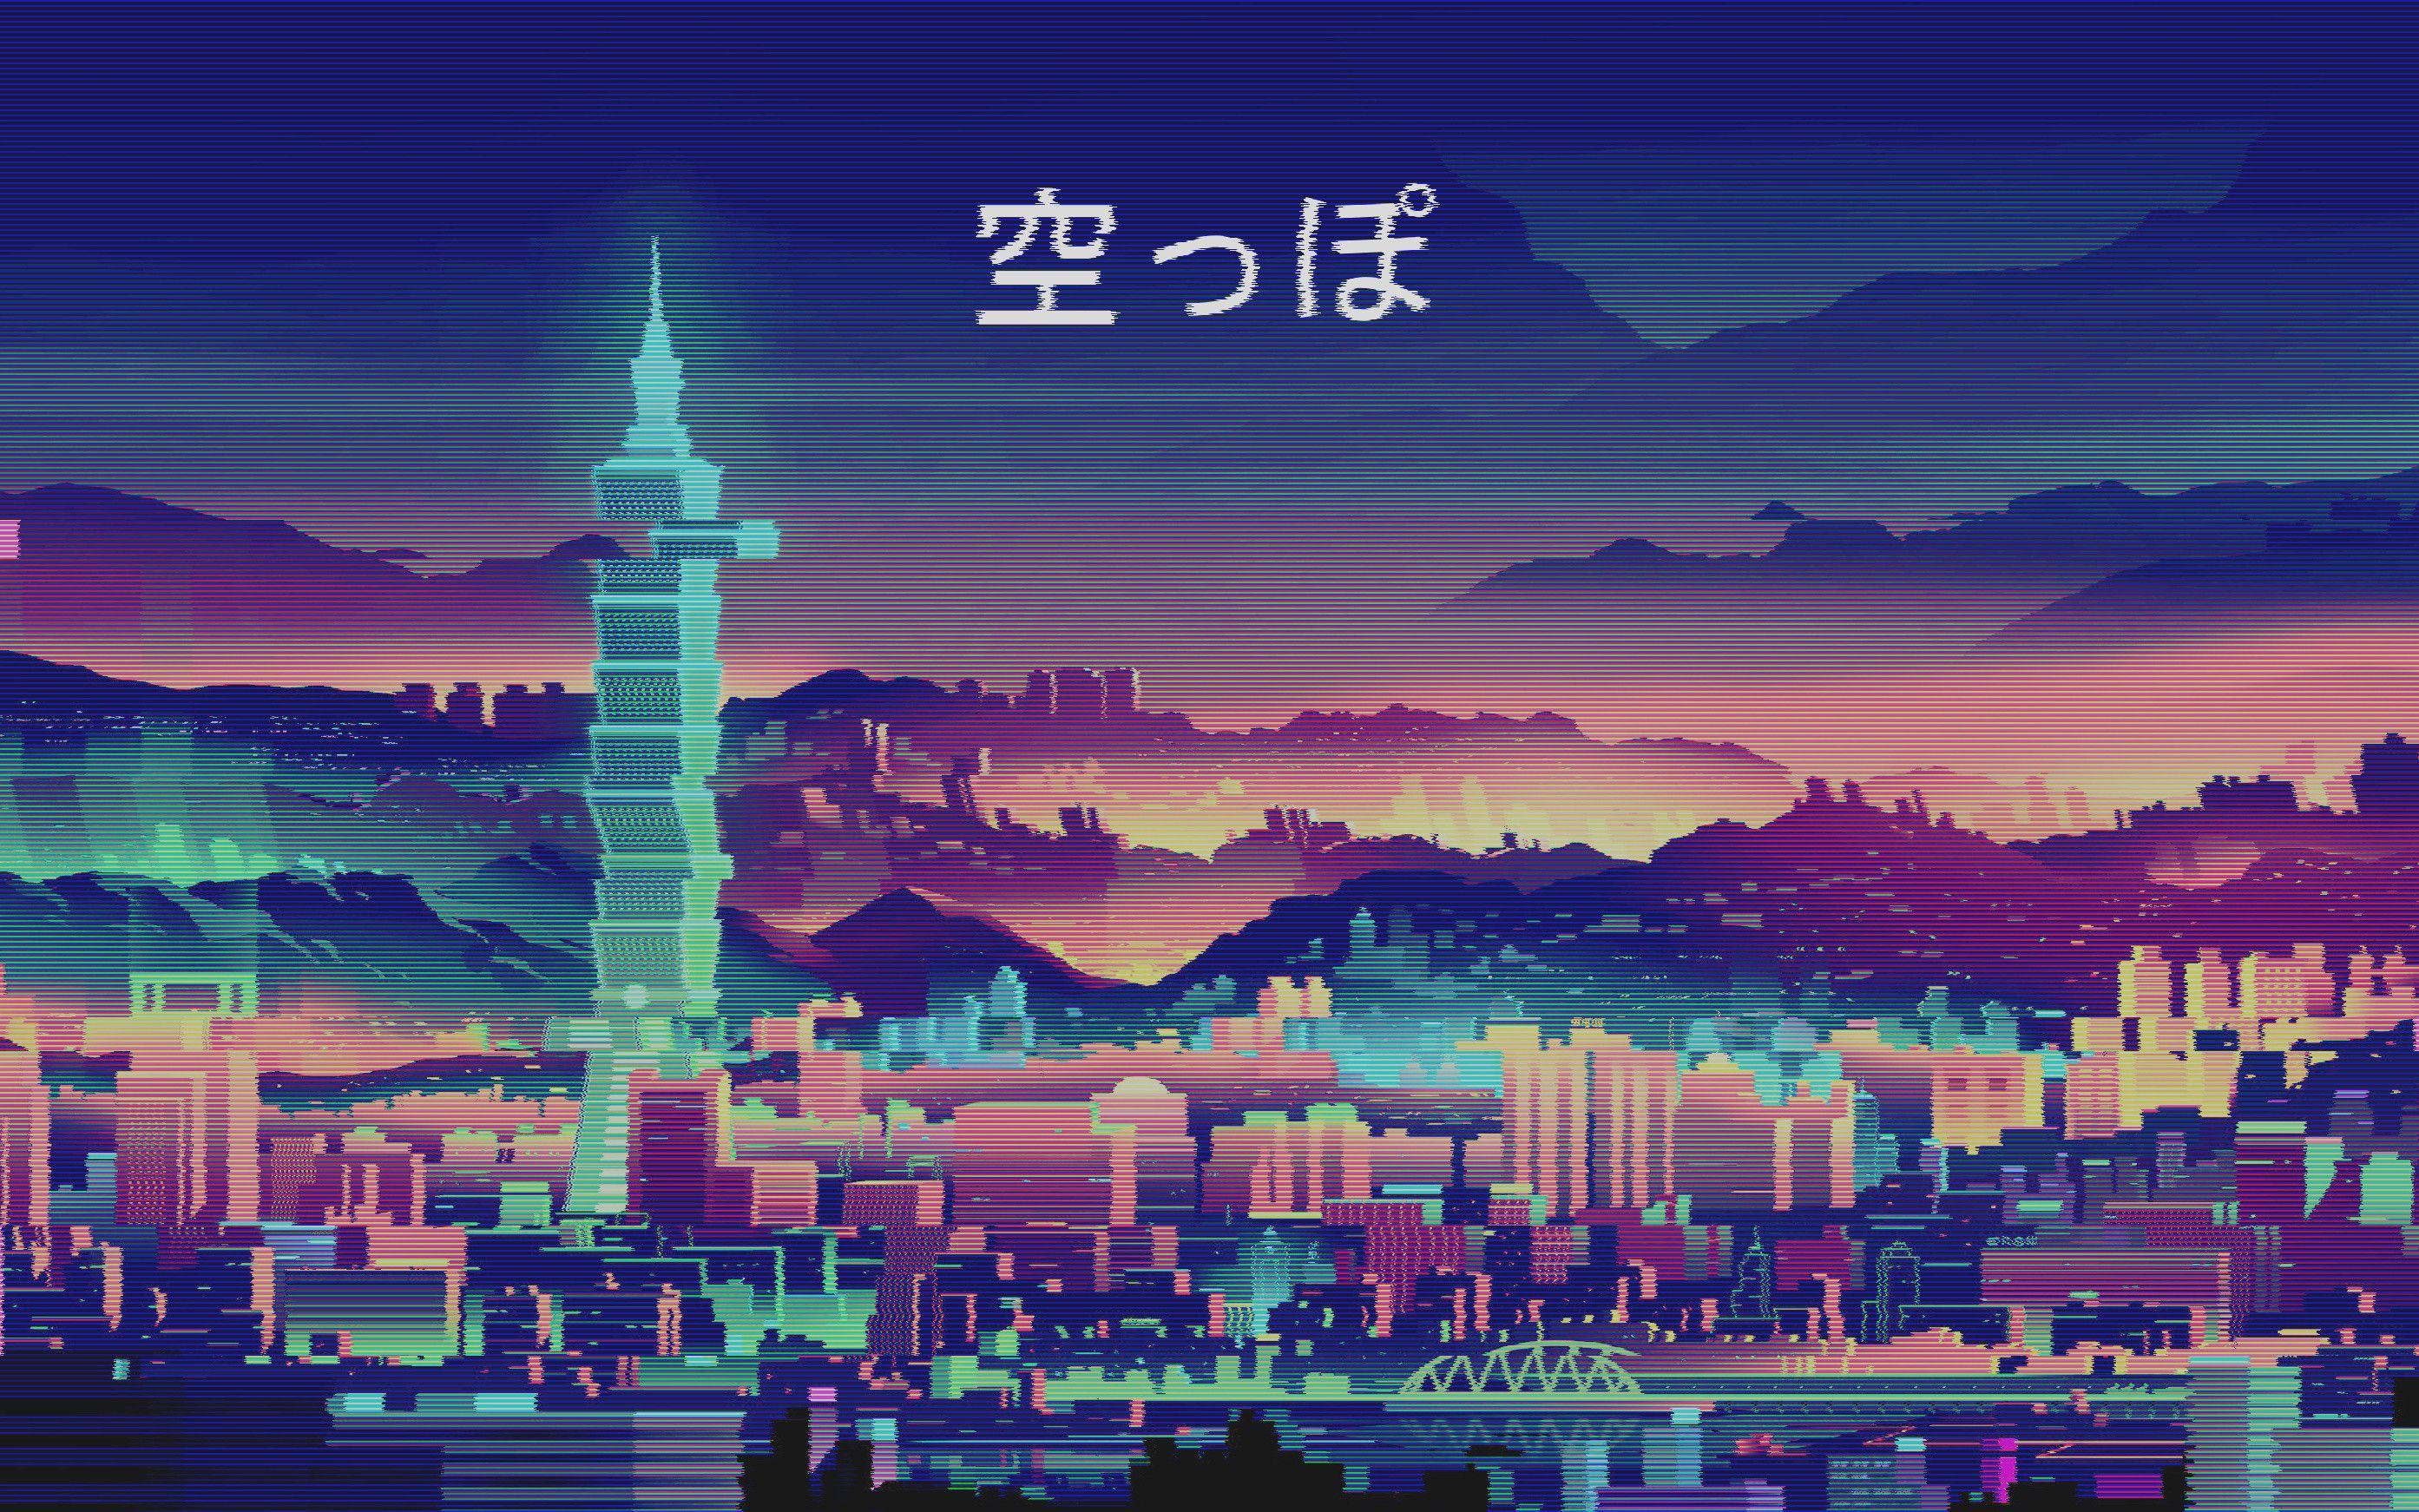 Lofi Anime Wallpaper Posted By Michelle Simpson